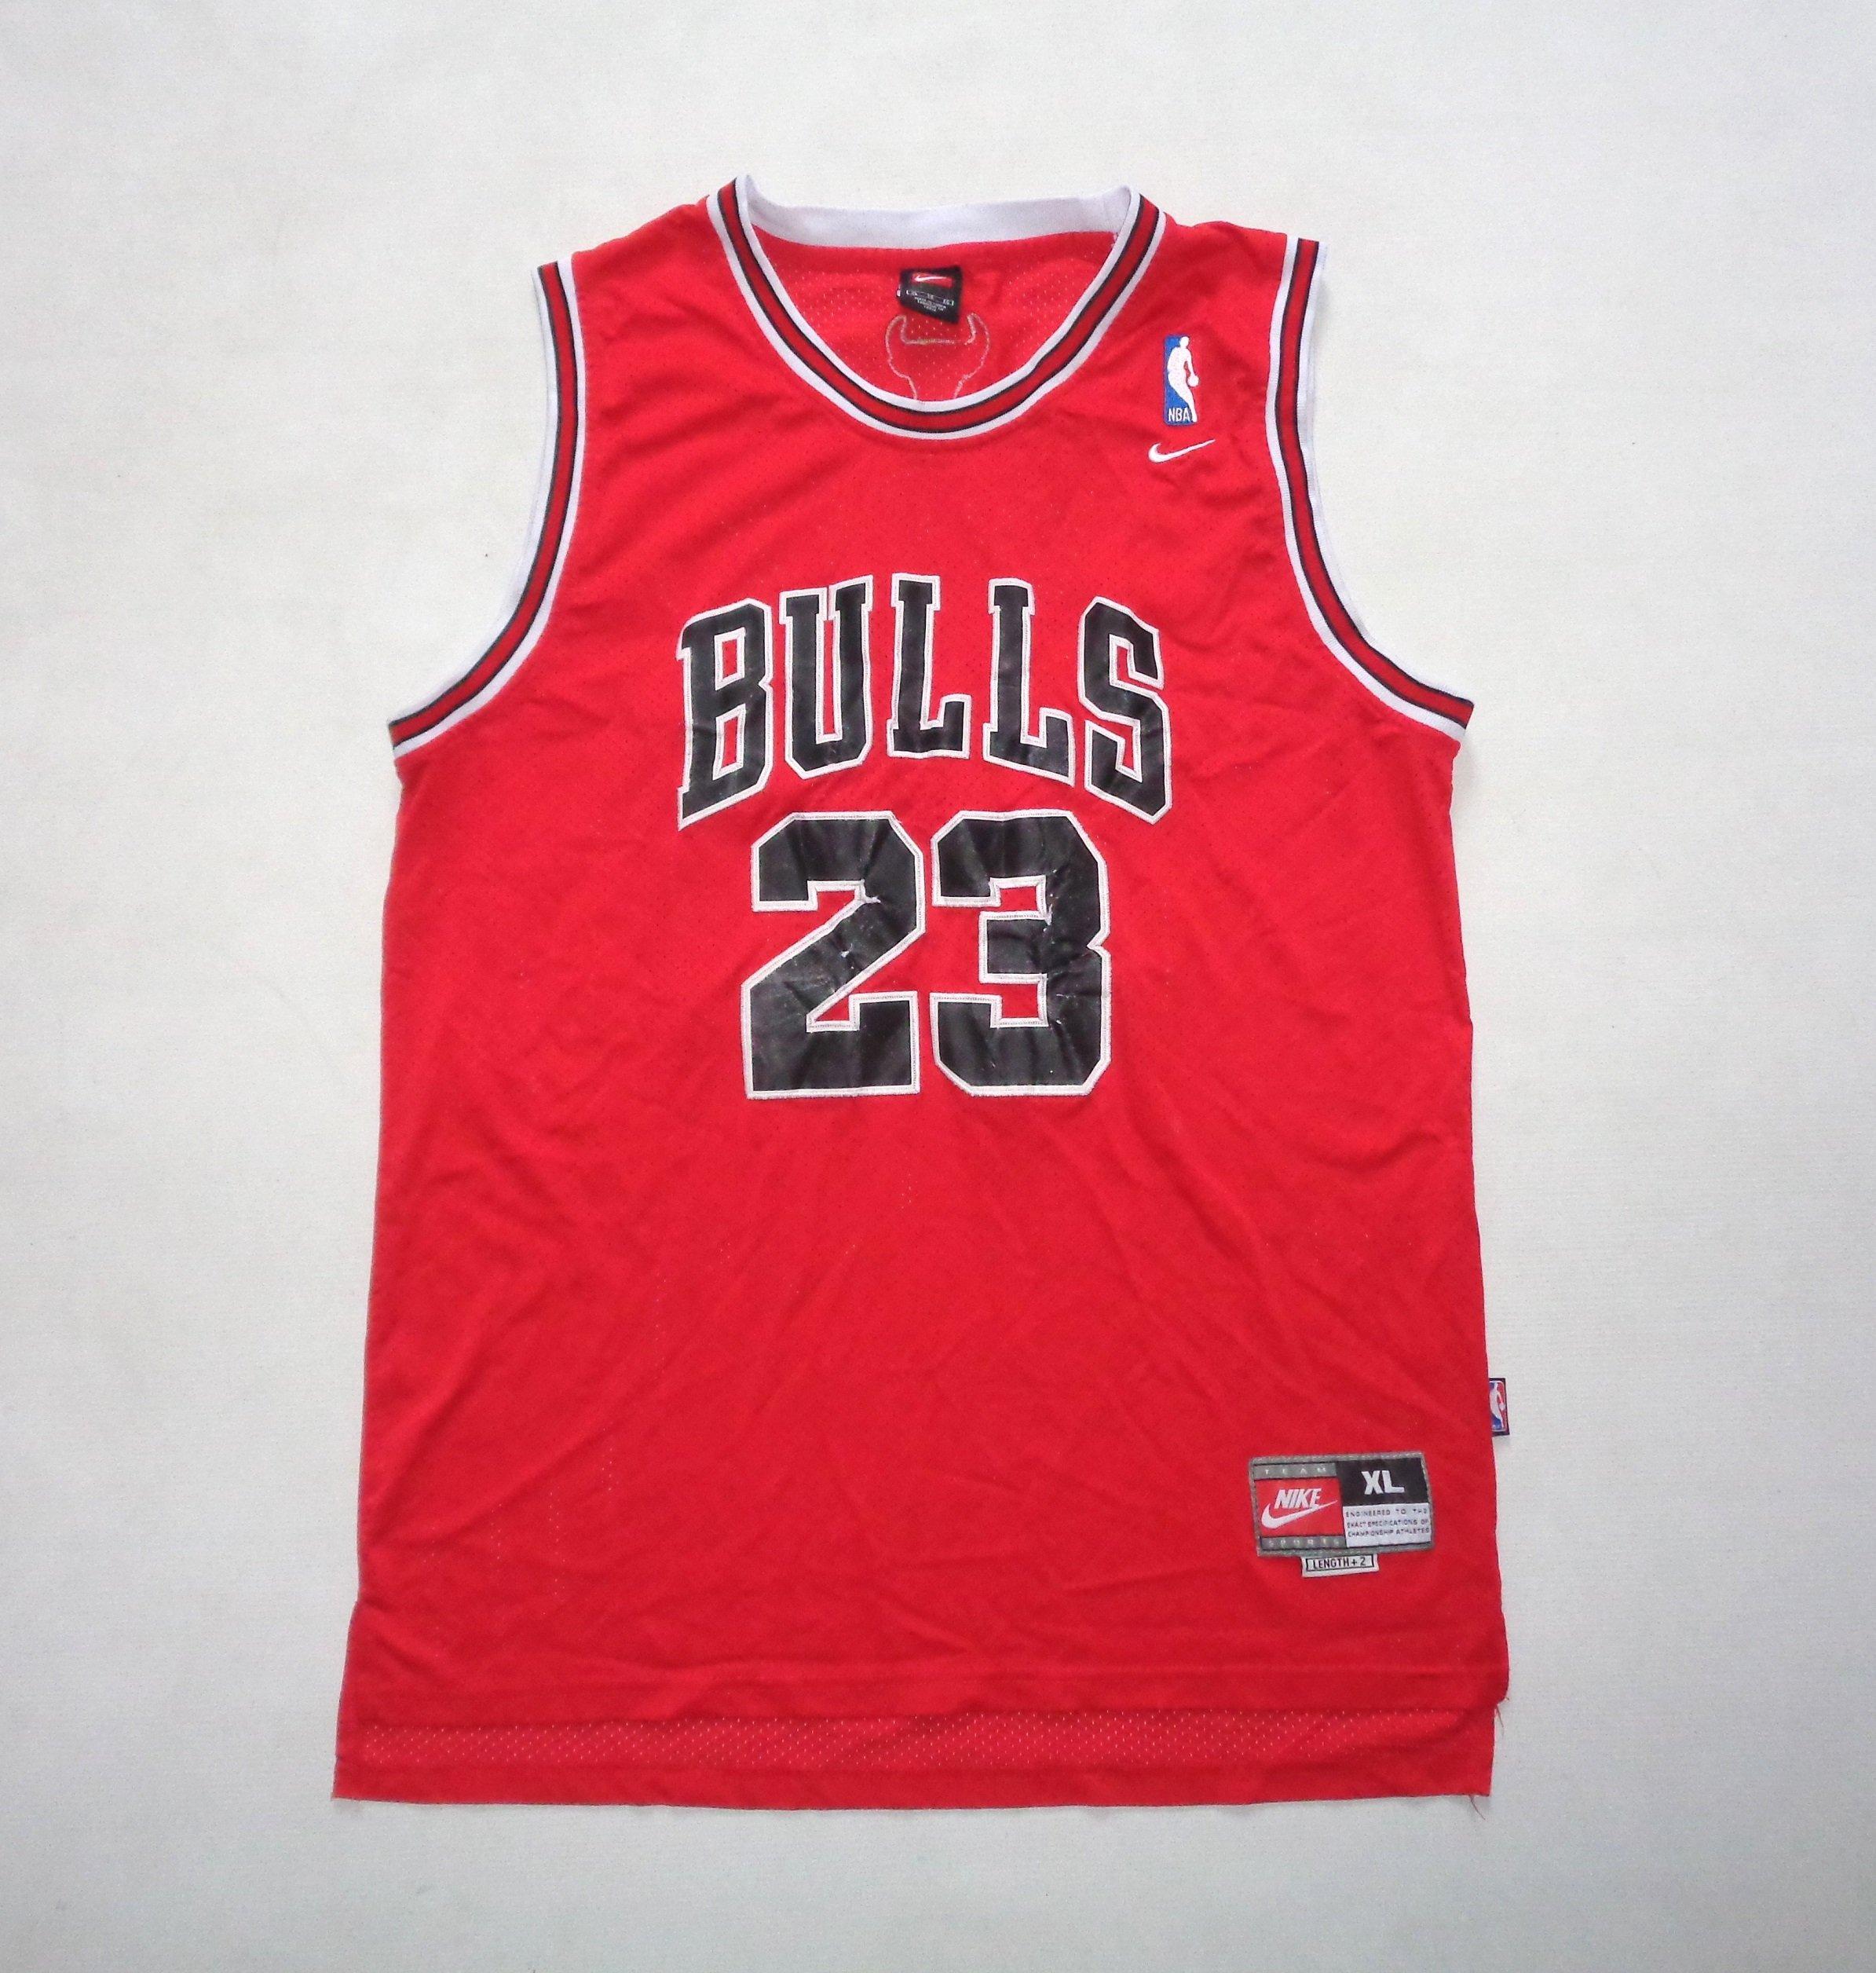 Nowość NIKE CHICAGO BULLS JORDAN 23 koszulka NBA - XL - - 7233504518 YM75